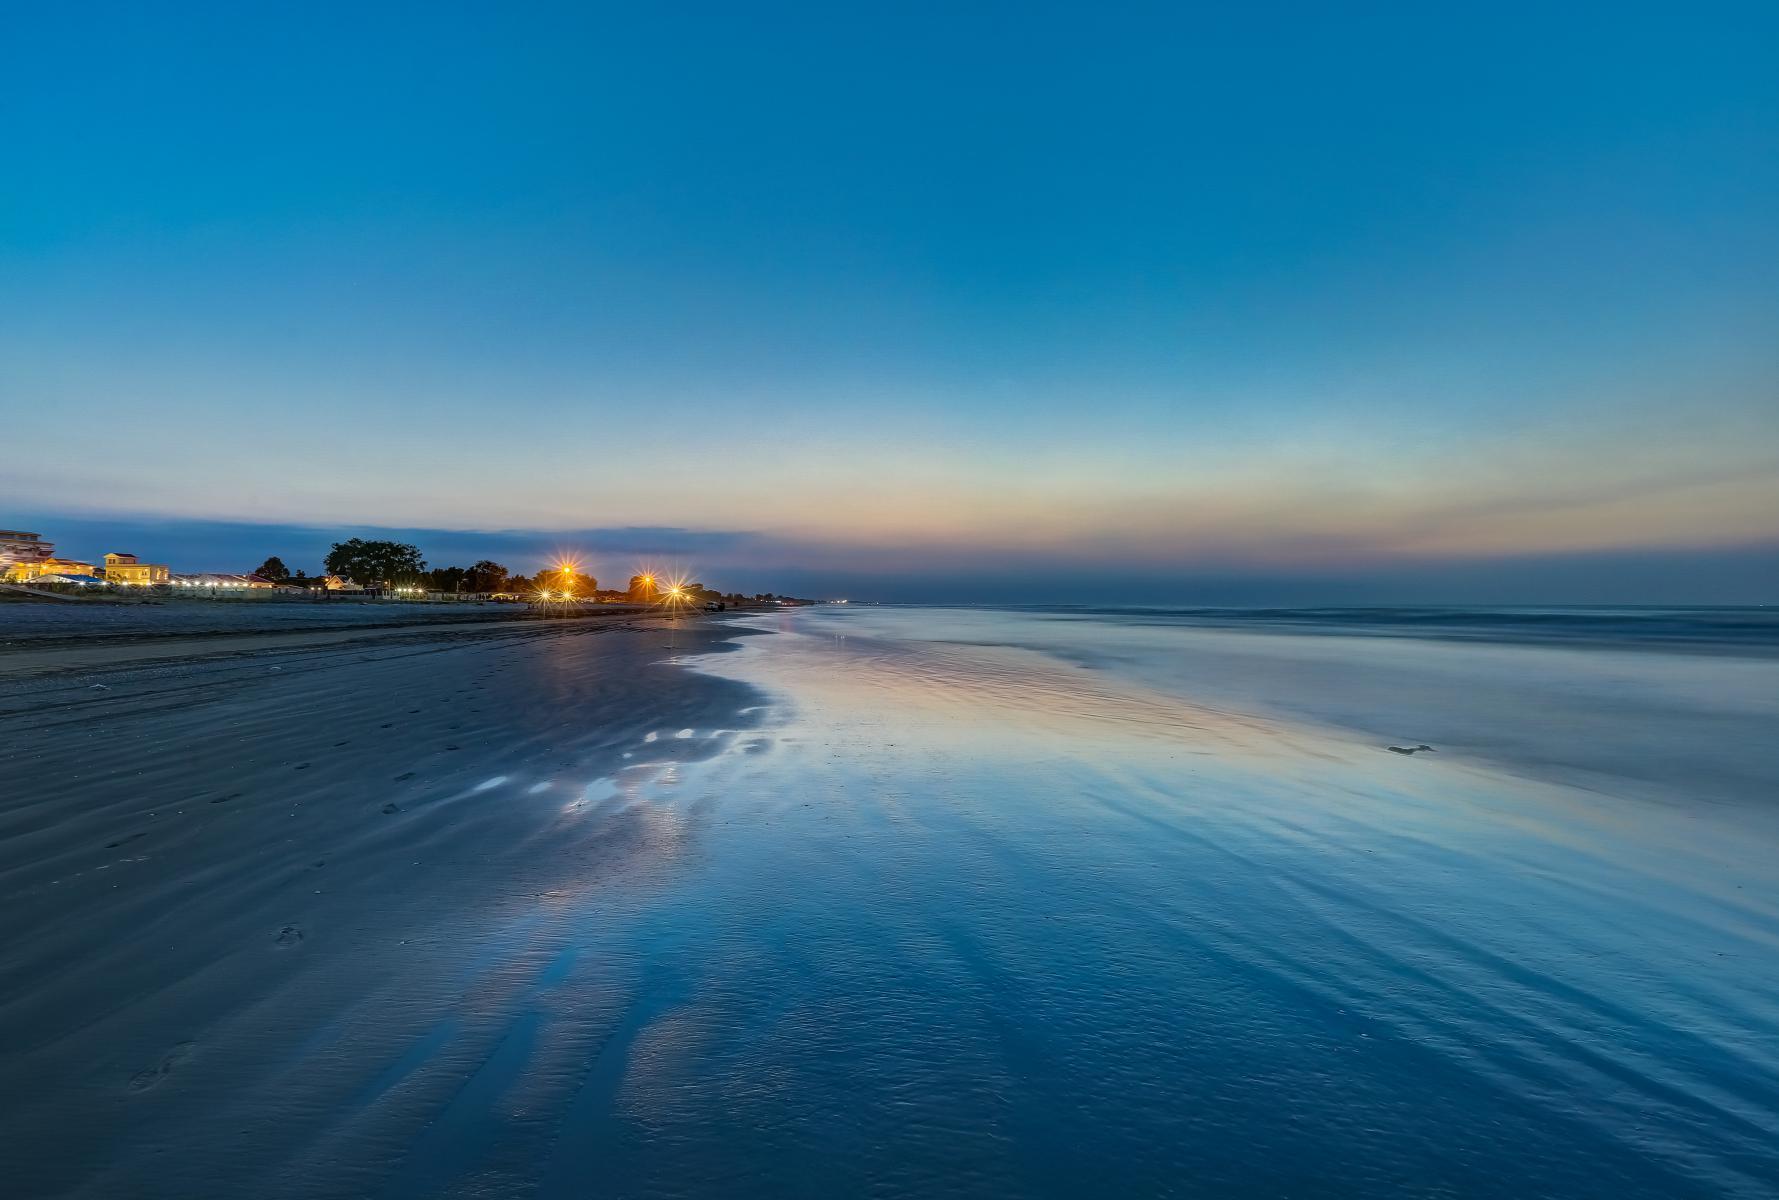 ساحل فقط انزلی